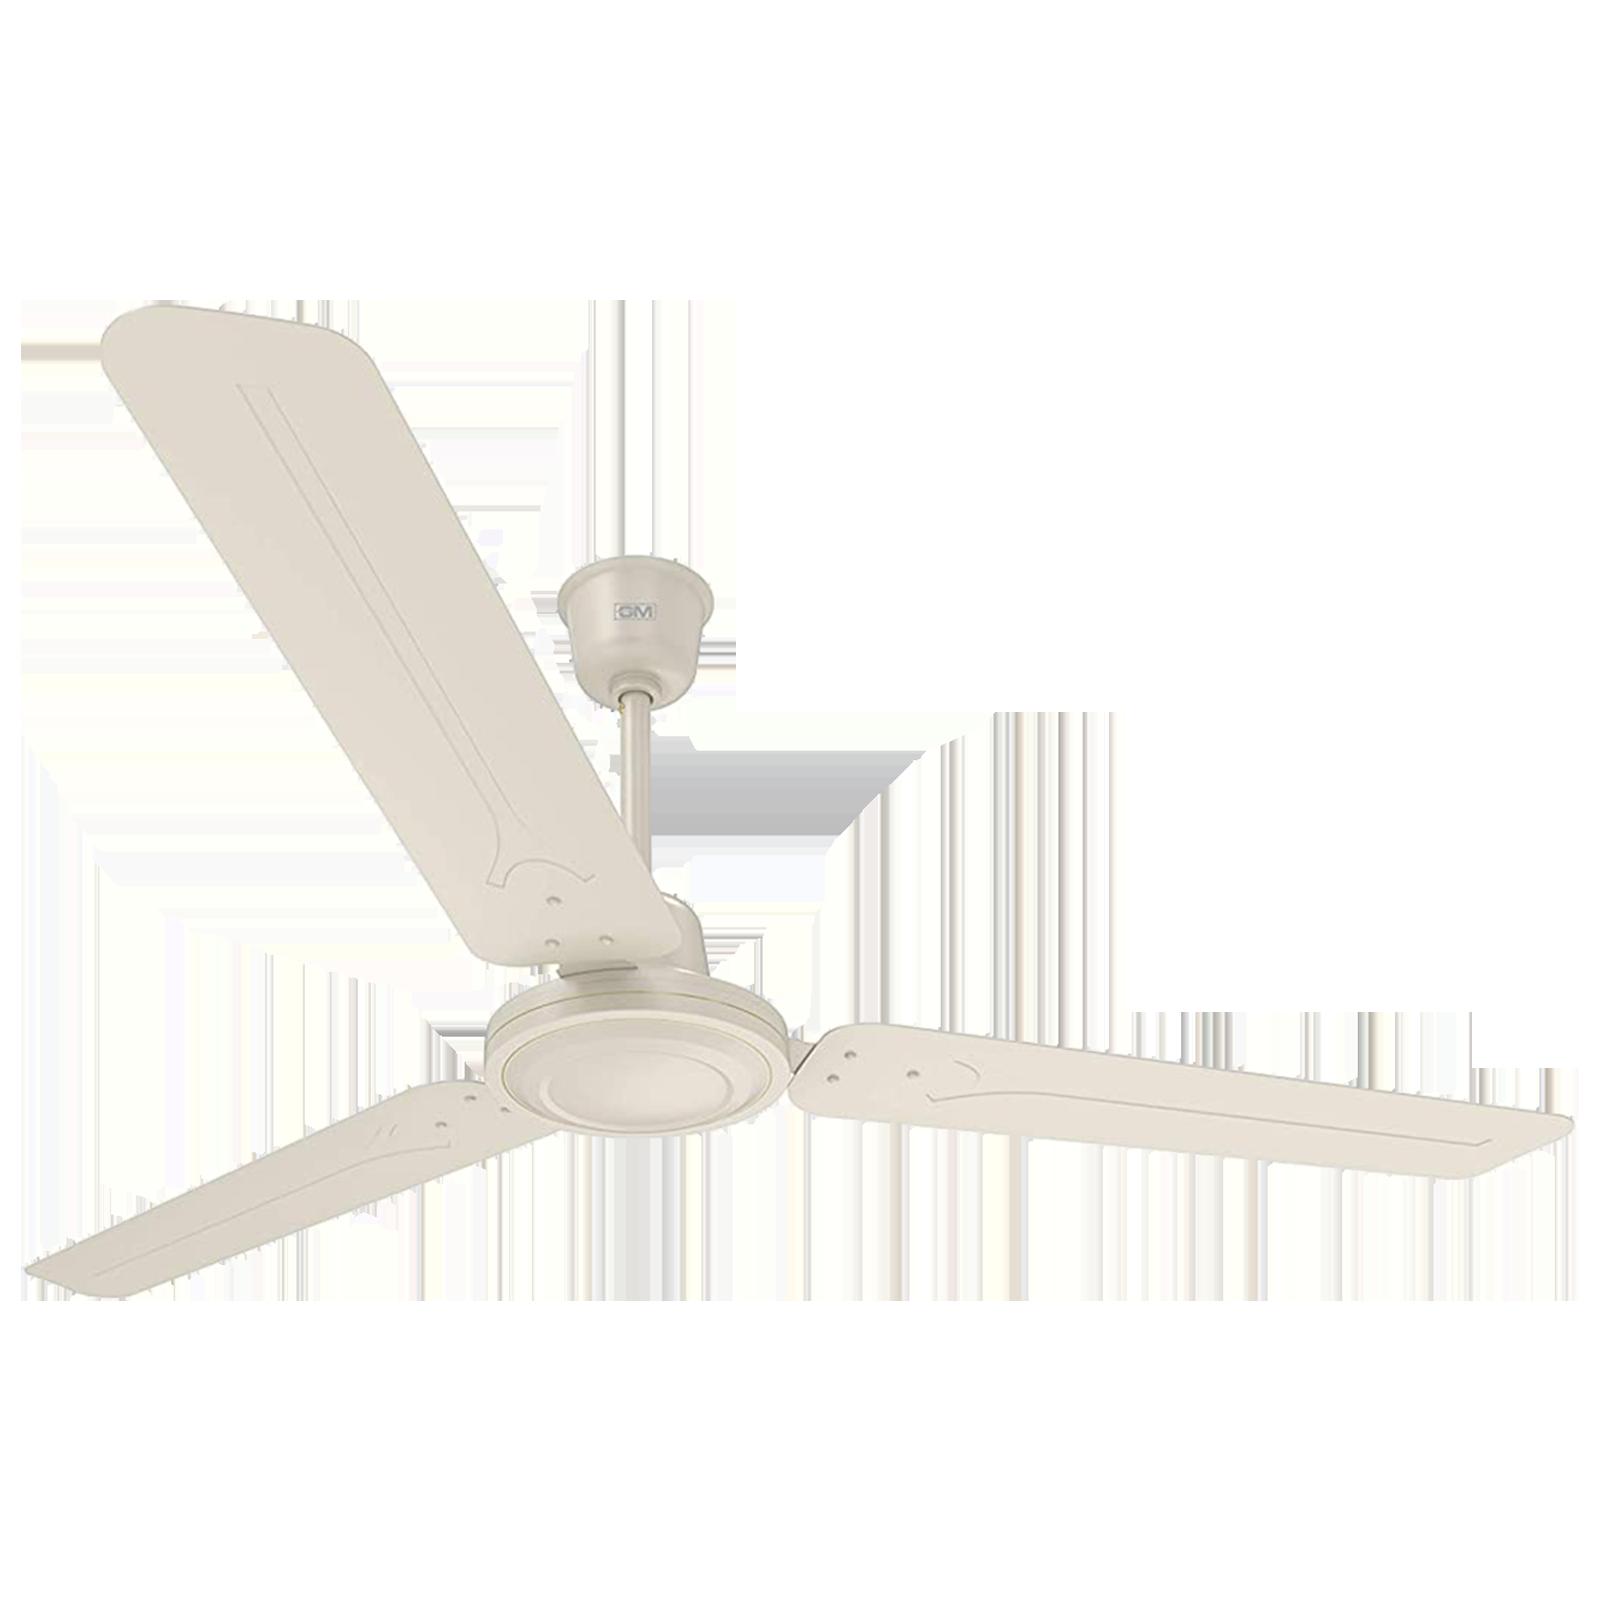 GM Breeze 120 cm Sweep 3 Blade Ceiling Fan (Energy Efficient, CFB480008IVGL, White)_1